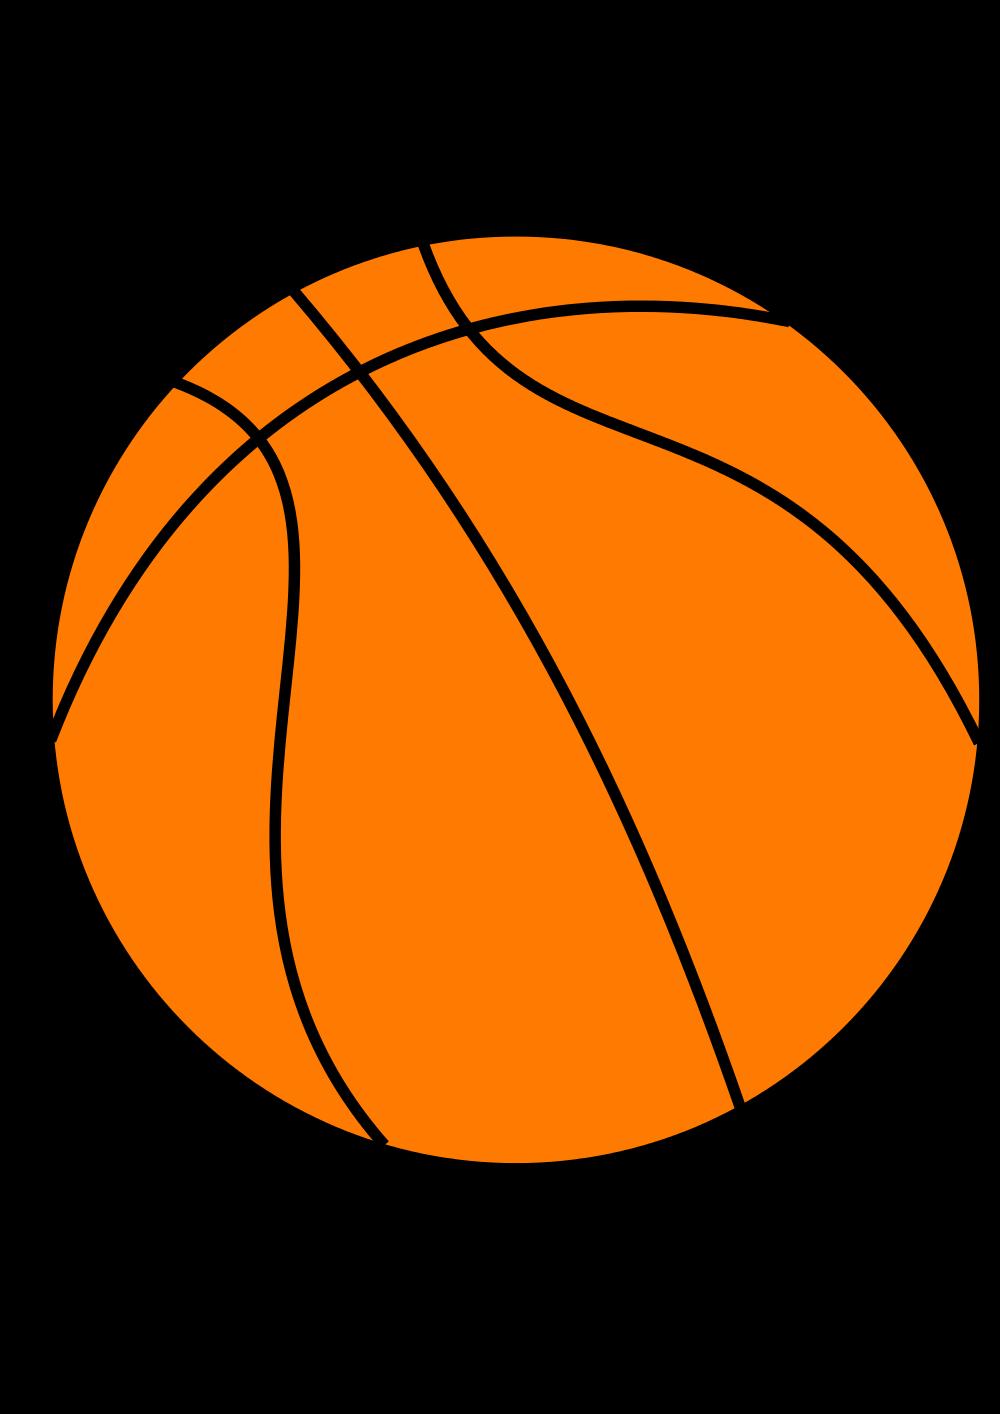 Animated cliparts shop of. Santa clipart basketball